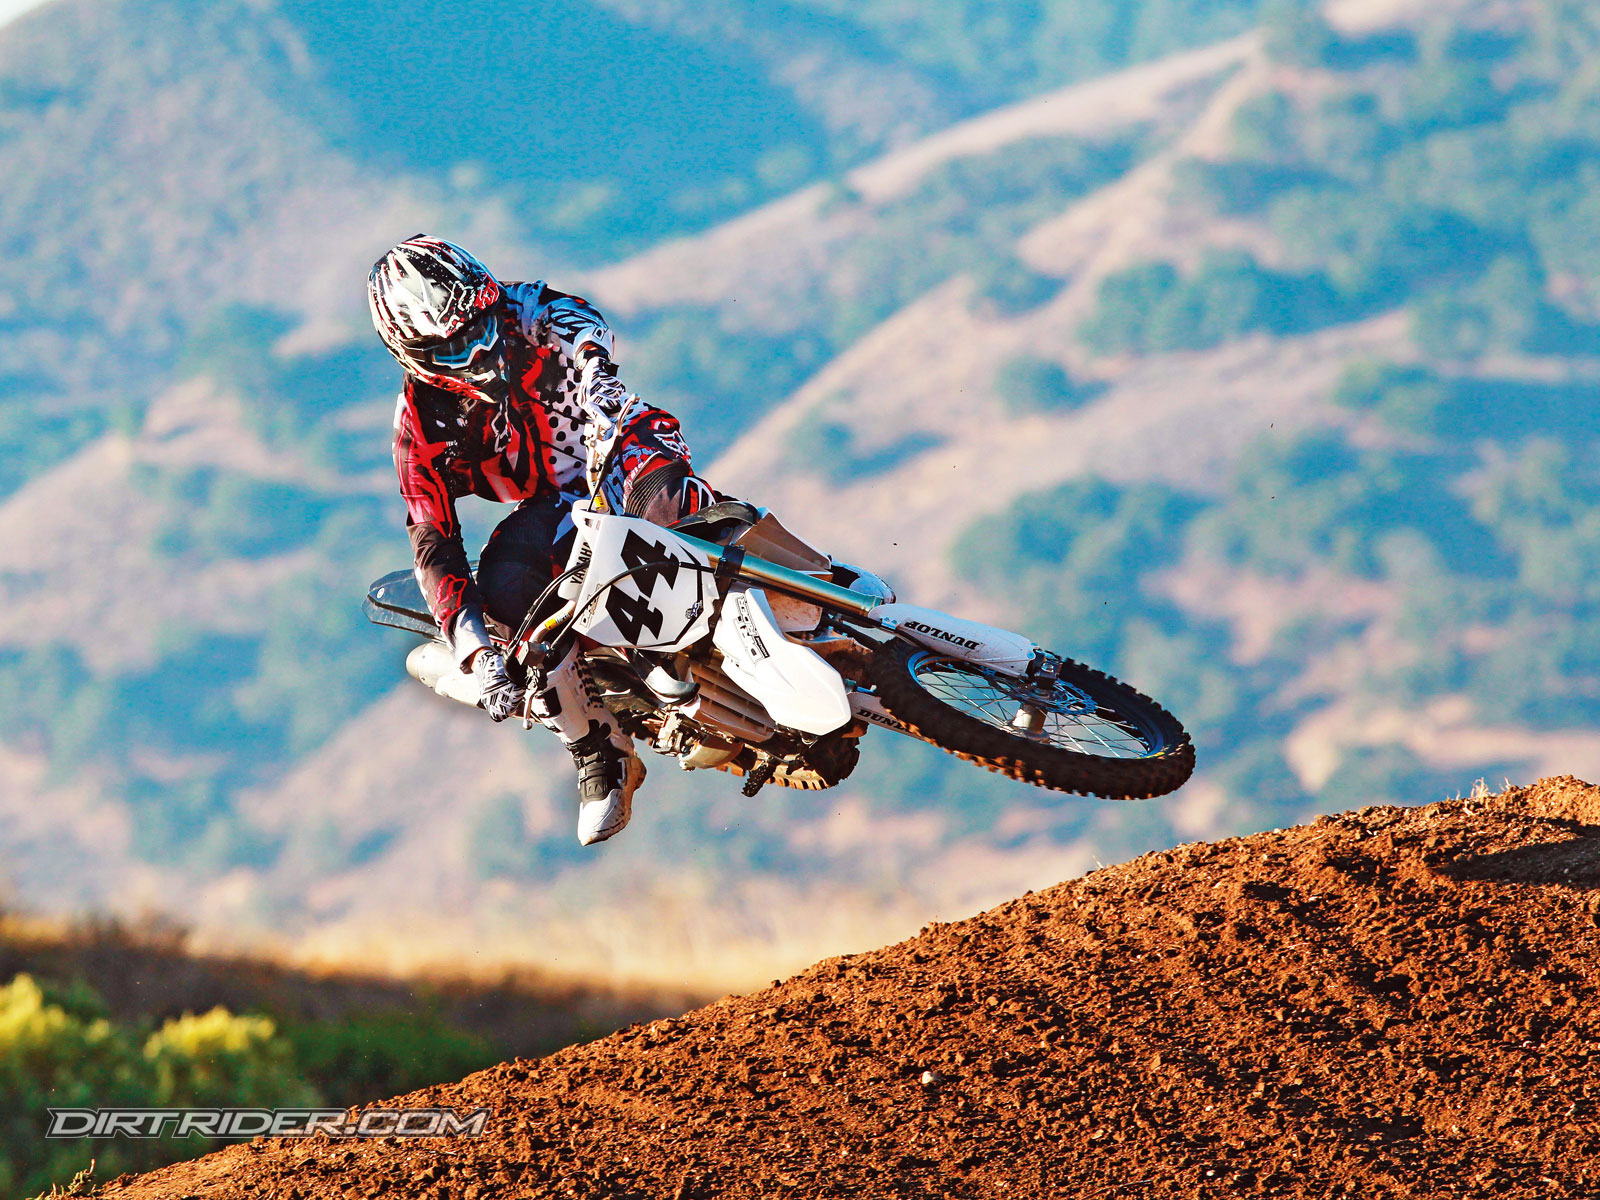 Yamaha Yz450f Dirt Motorcycle Wallpaper Hd Desktop: HD Dirt Bike Wallpapers